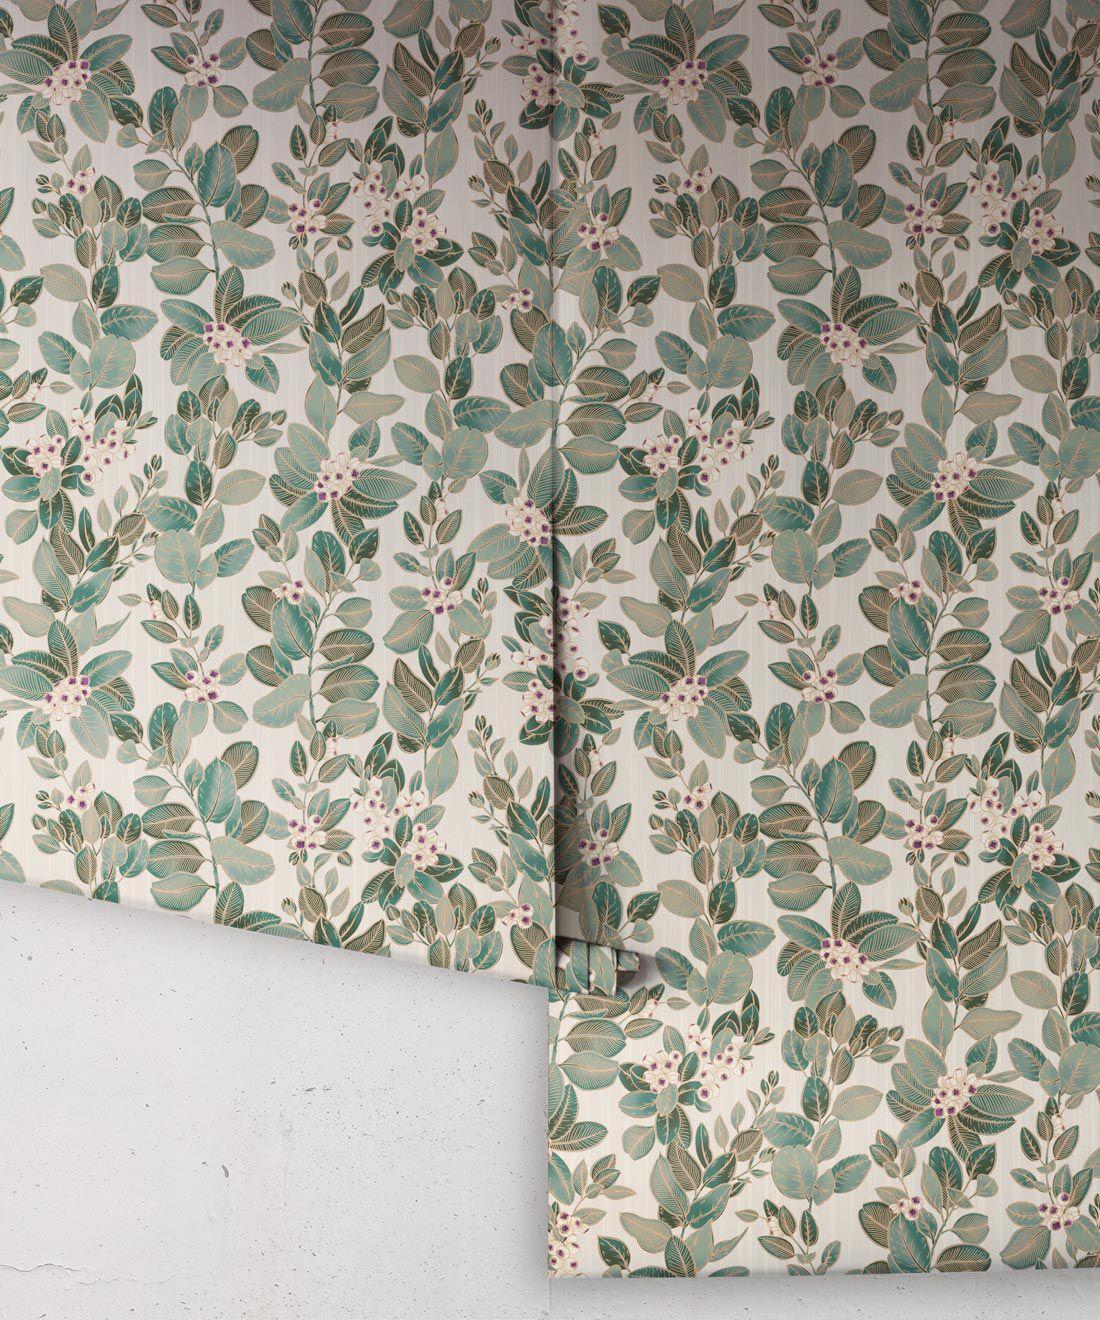 Eucalyptus Wallpaper • Eloise Short • Vintage Floral Wallpaper •Granny Chic Wallpaper • Grandmillennial Style Wallpaper •Pearl •Rolls